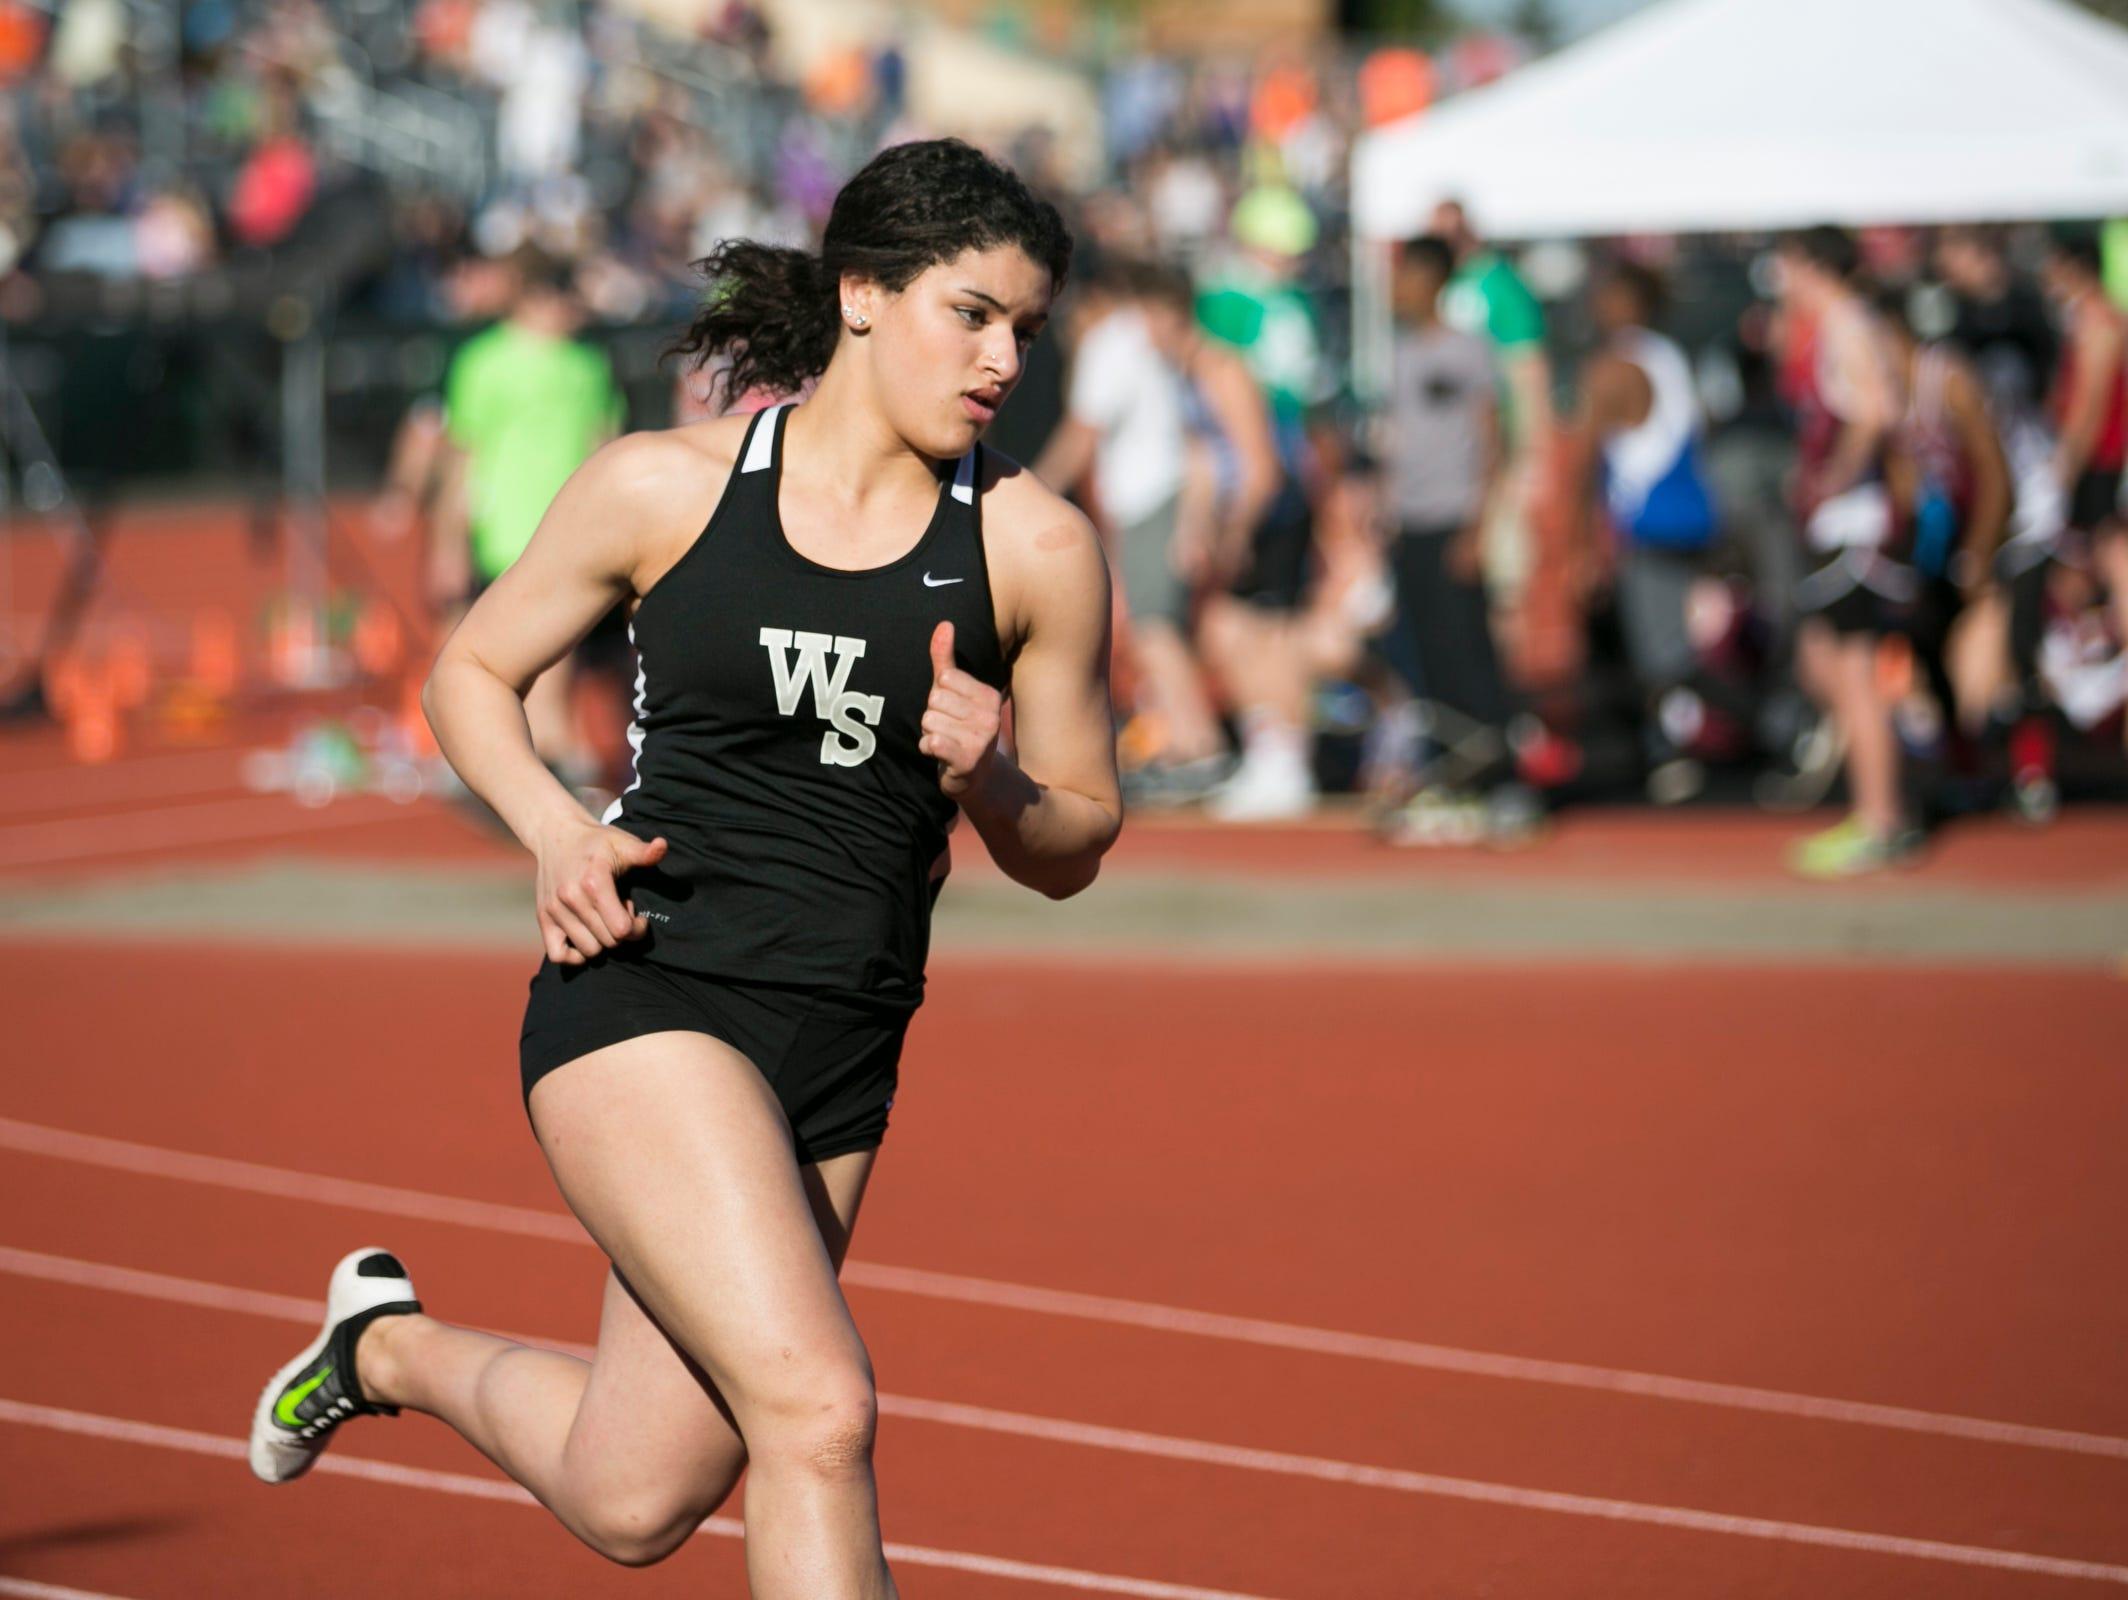 West Salem's Cari McCrae runs the girls 400 meter at the Titan Track Classic at West Salem High School on Friday, April 1, 2016.